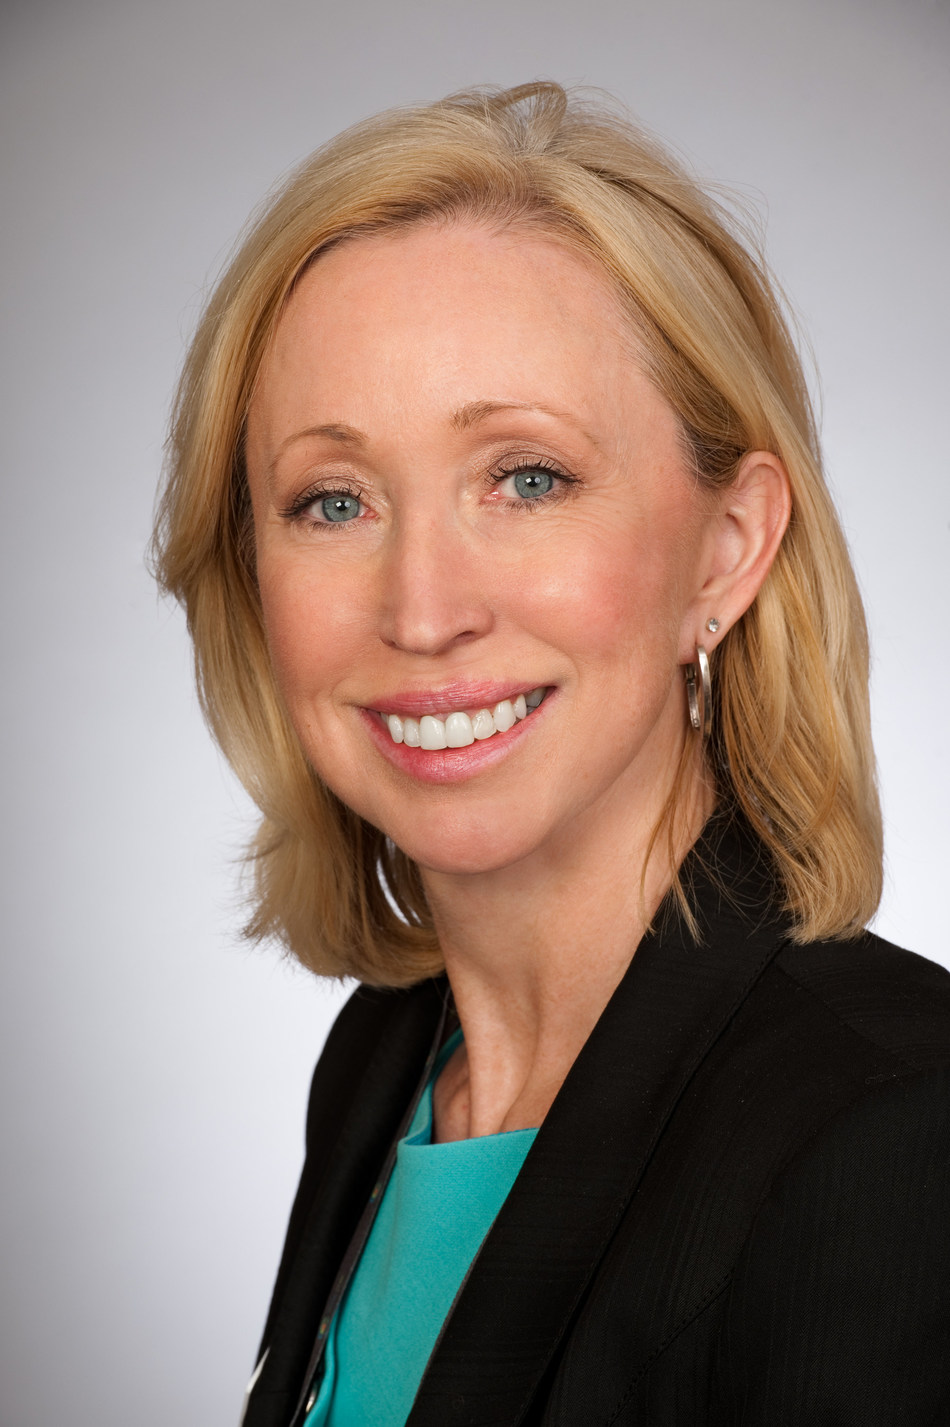 Caroline Brereton (CNW Group/Ontario Chiropractic Association)